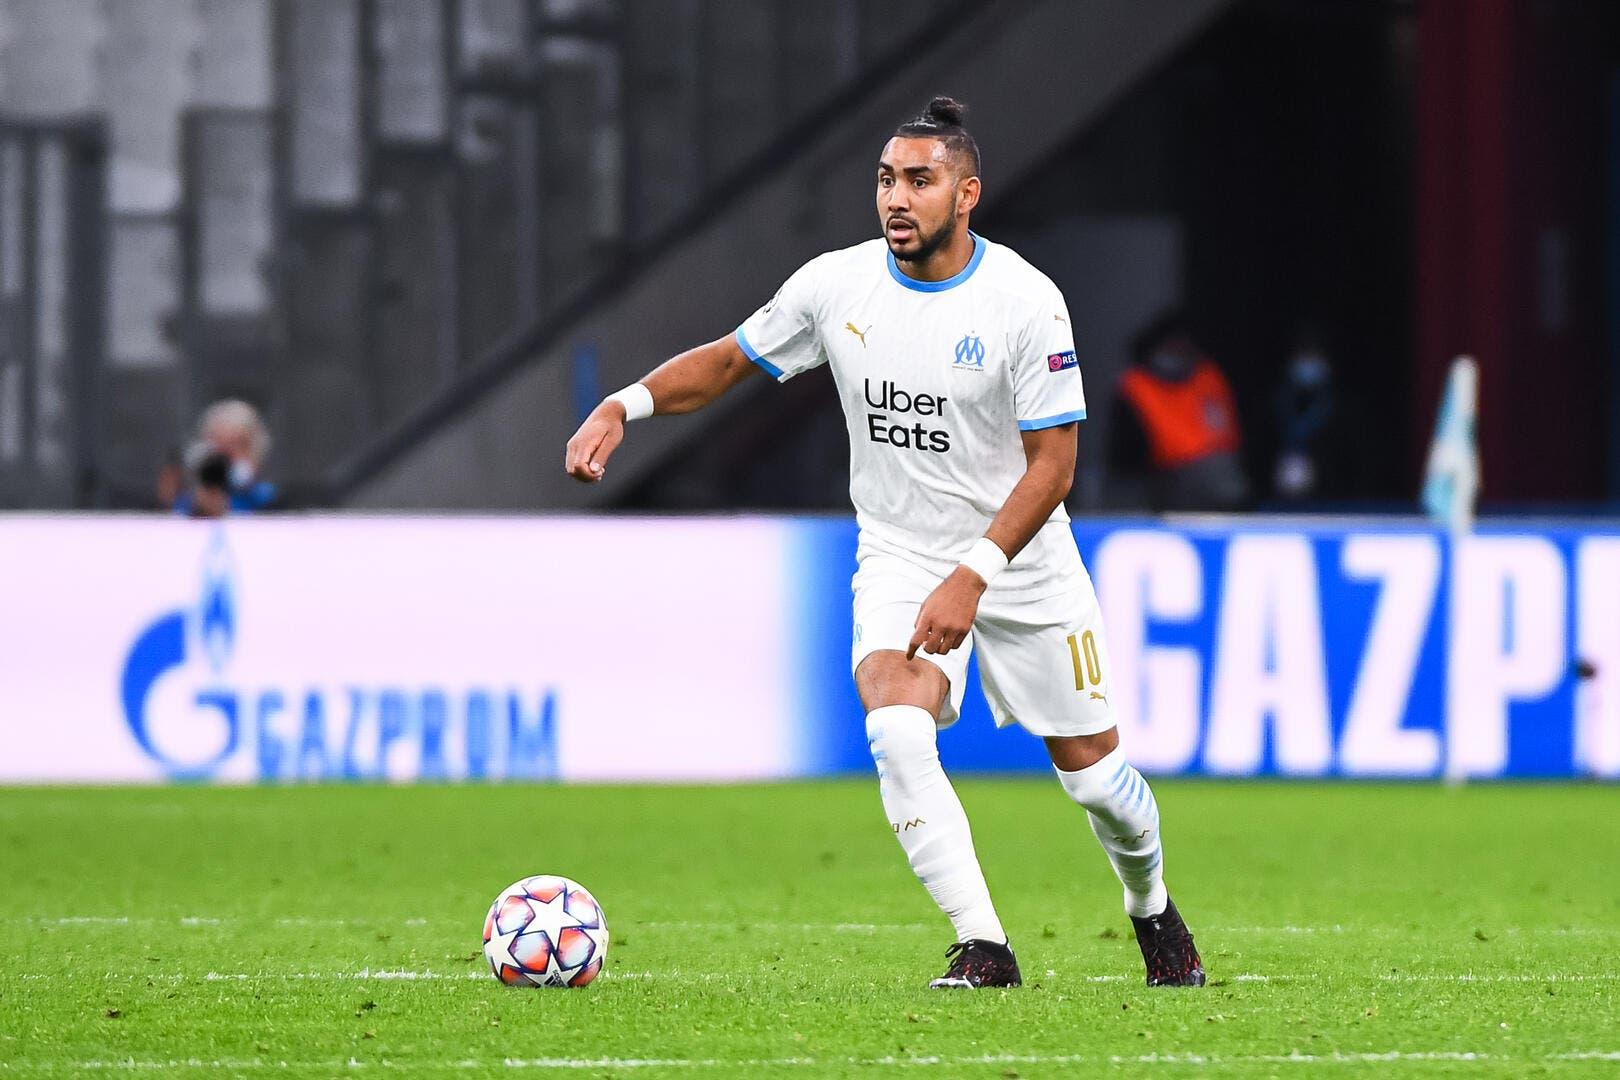 OM : Payet trop gros ? Villas-Boas attaque L'Equipe ! - Foot01.com